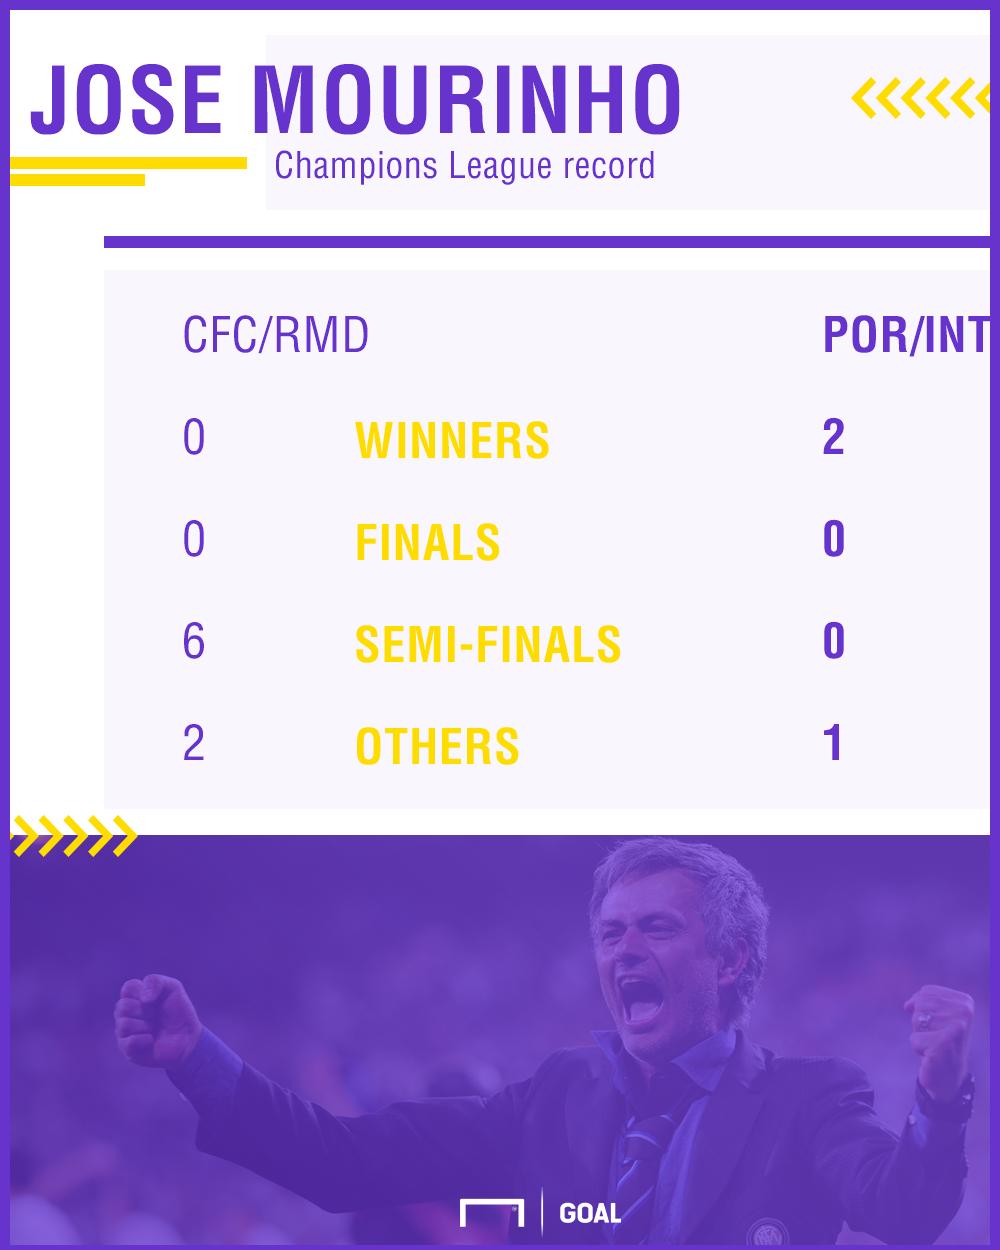 Jose Mourinho in Champions League